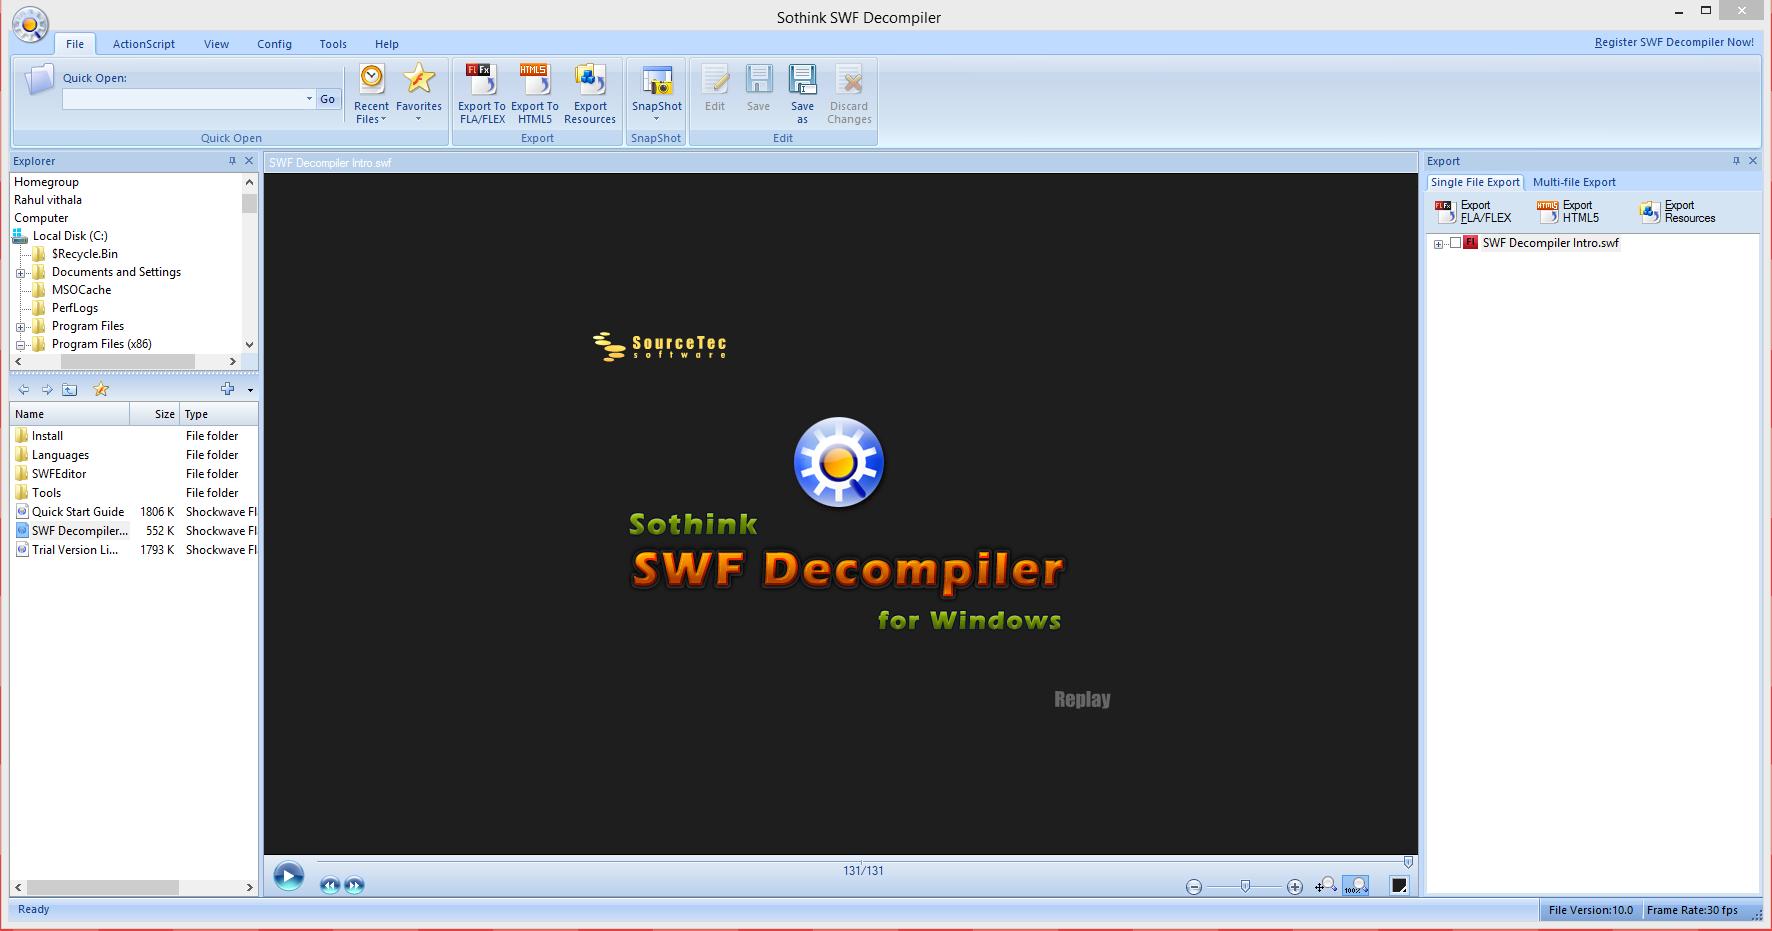 Quickly Debug Your SWF Flash Files With SWF Decompiler